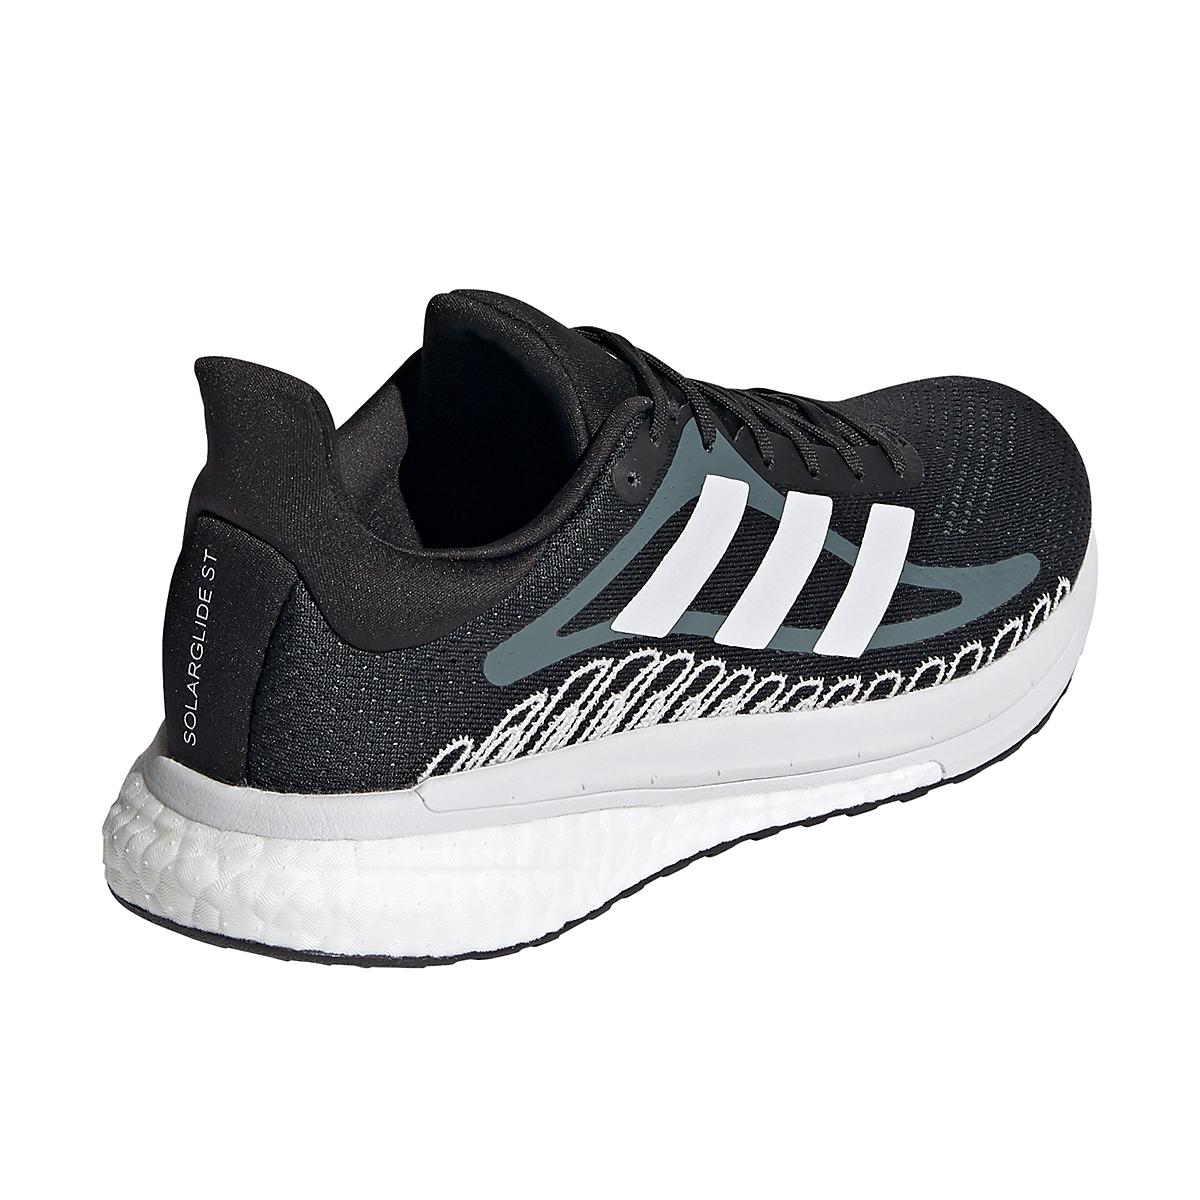 Women's Adidas Solar Glide ST 3 Running Shoe - Color: Core Black - Size: 5 - Width: Regular, Core Black, large, image 5